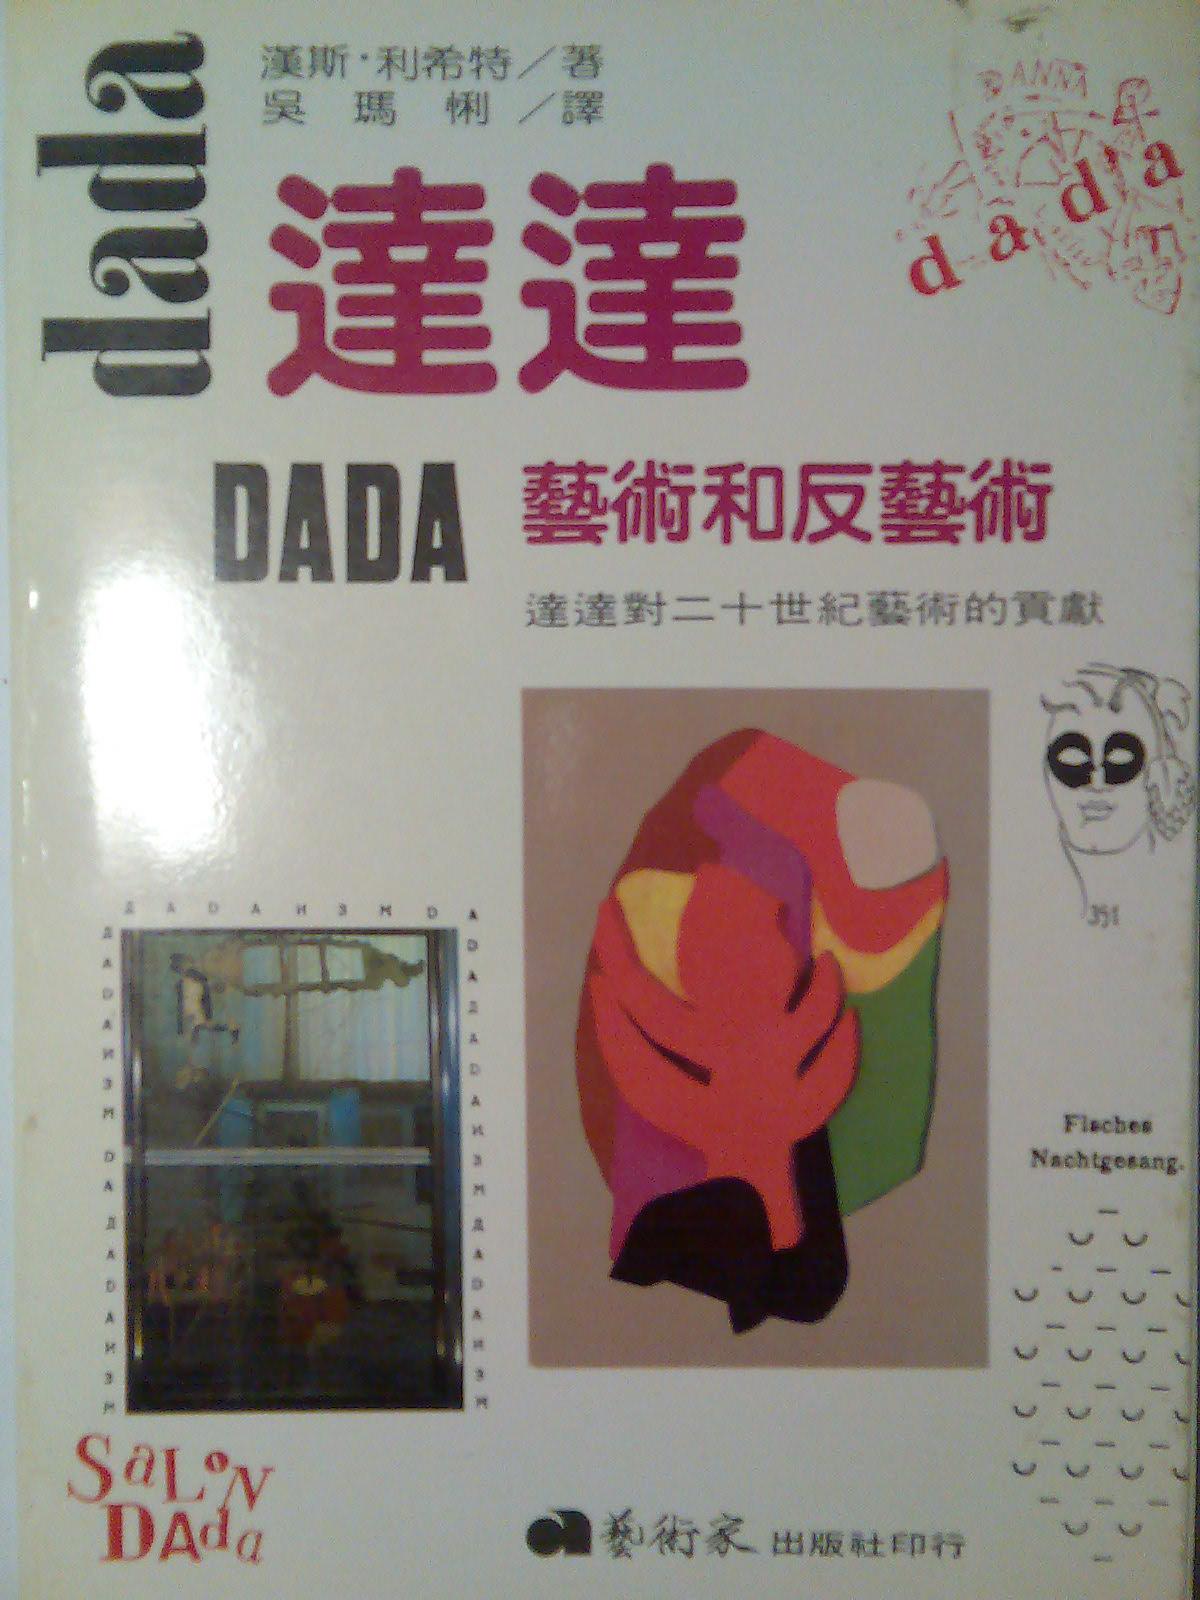 達達 藝術和反藝術